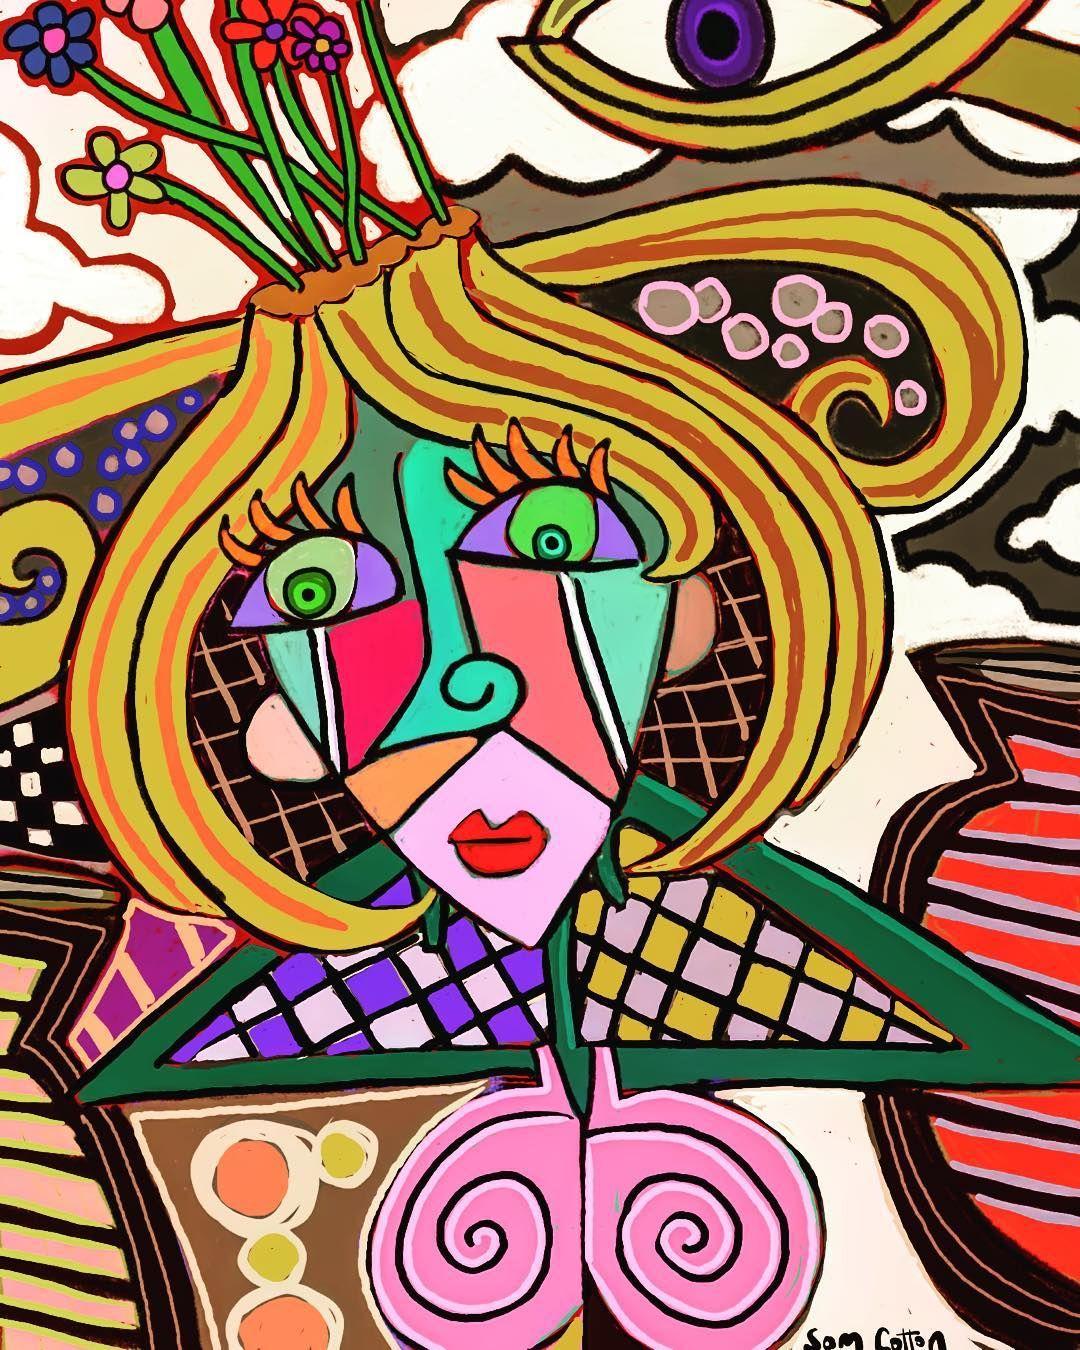 2011 job. #draw #art #colour #artfido #nawden #illustration #artsanity #arte #sketch #paint #drawing #SongforZula